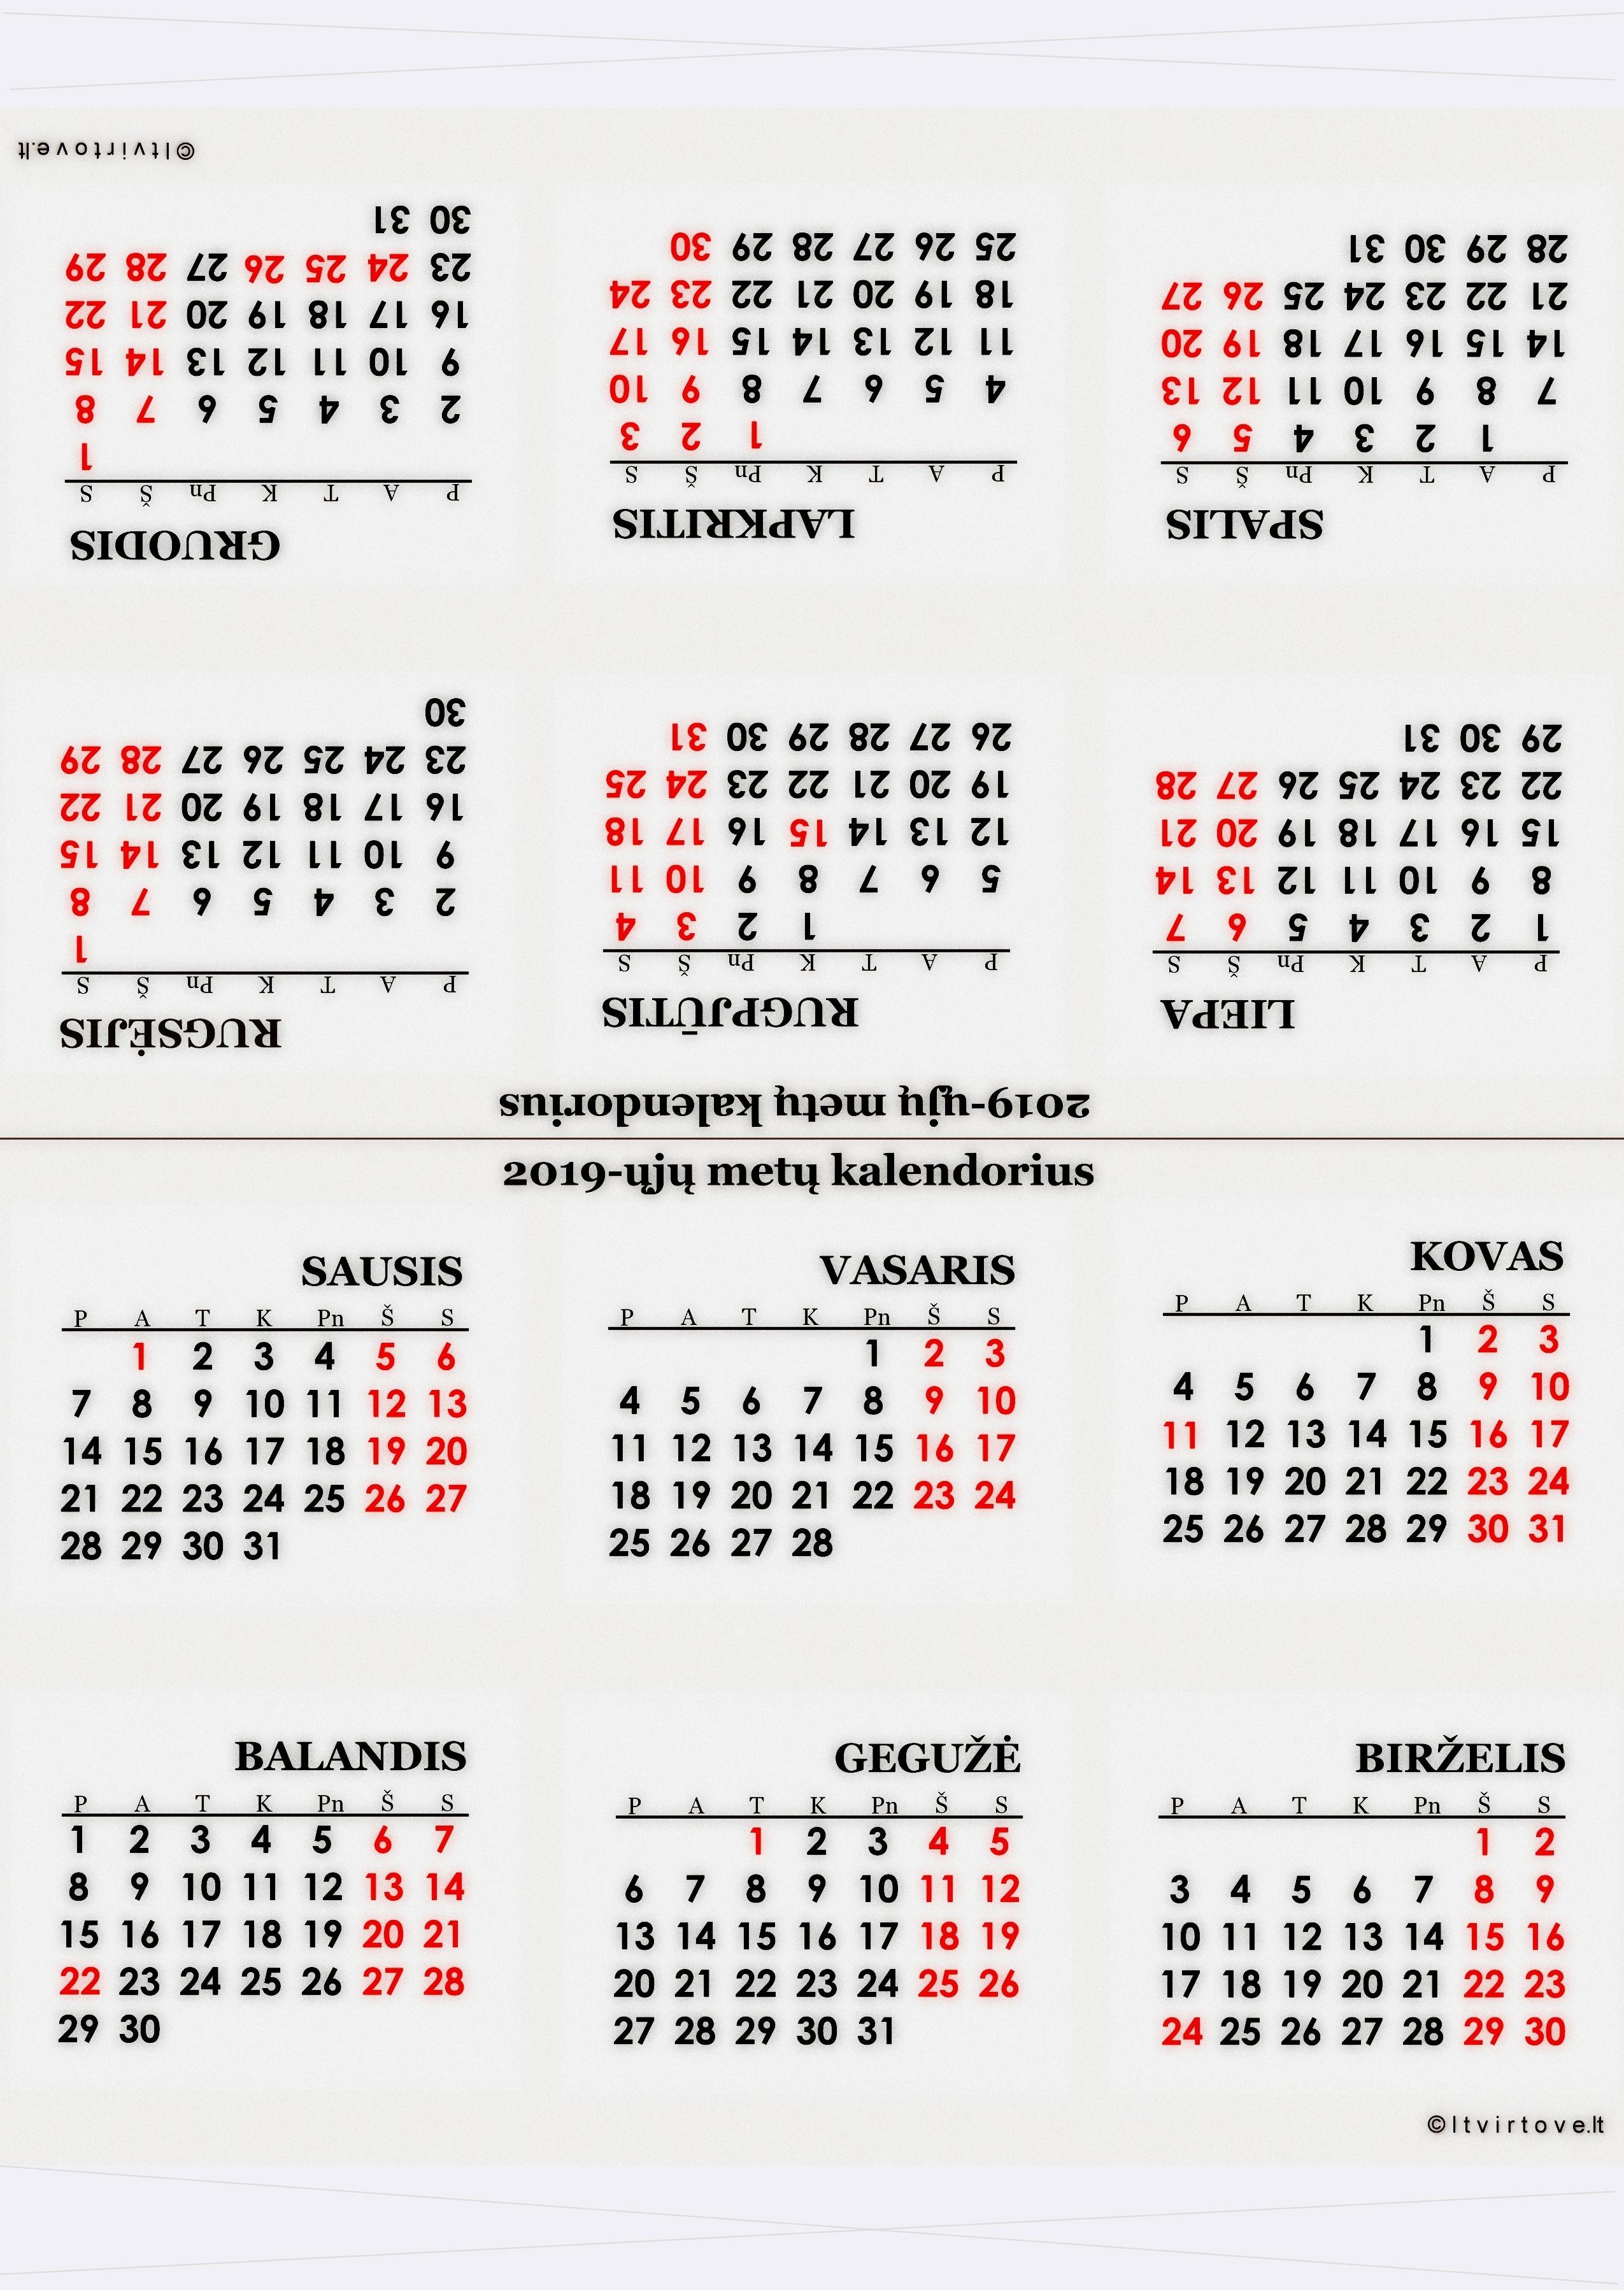 2020 Kalendorius.Kalendoriai 2019 Iesiems Metams Trikampio Formos